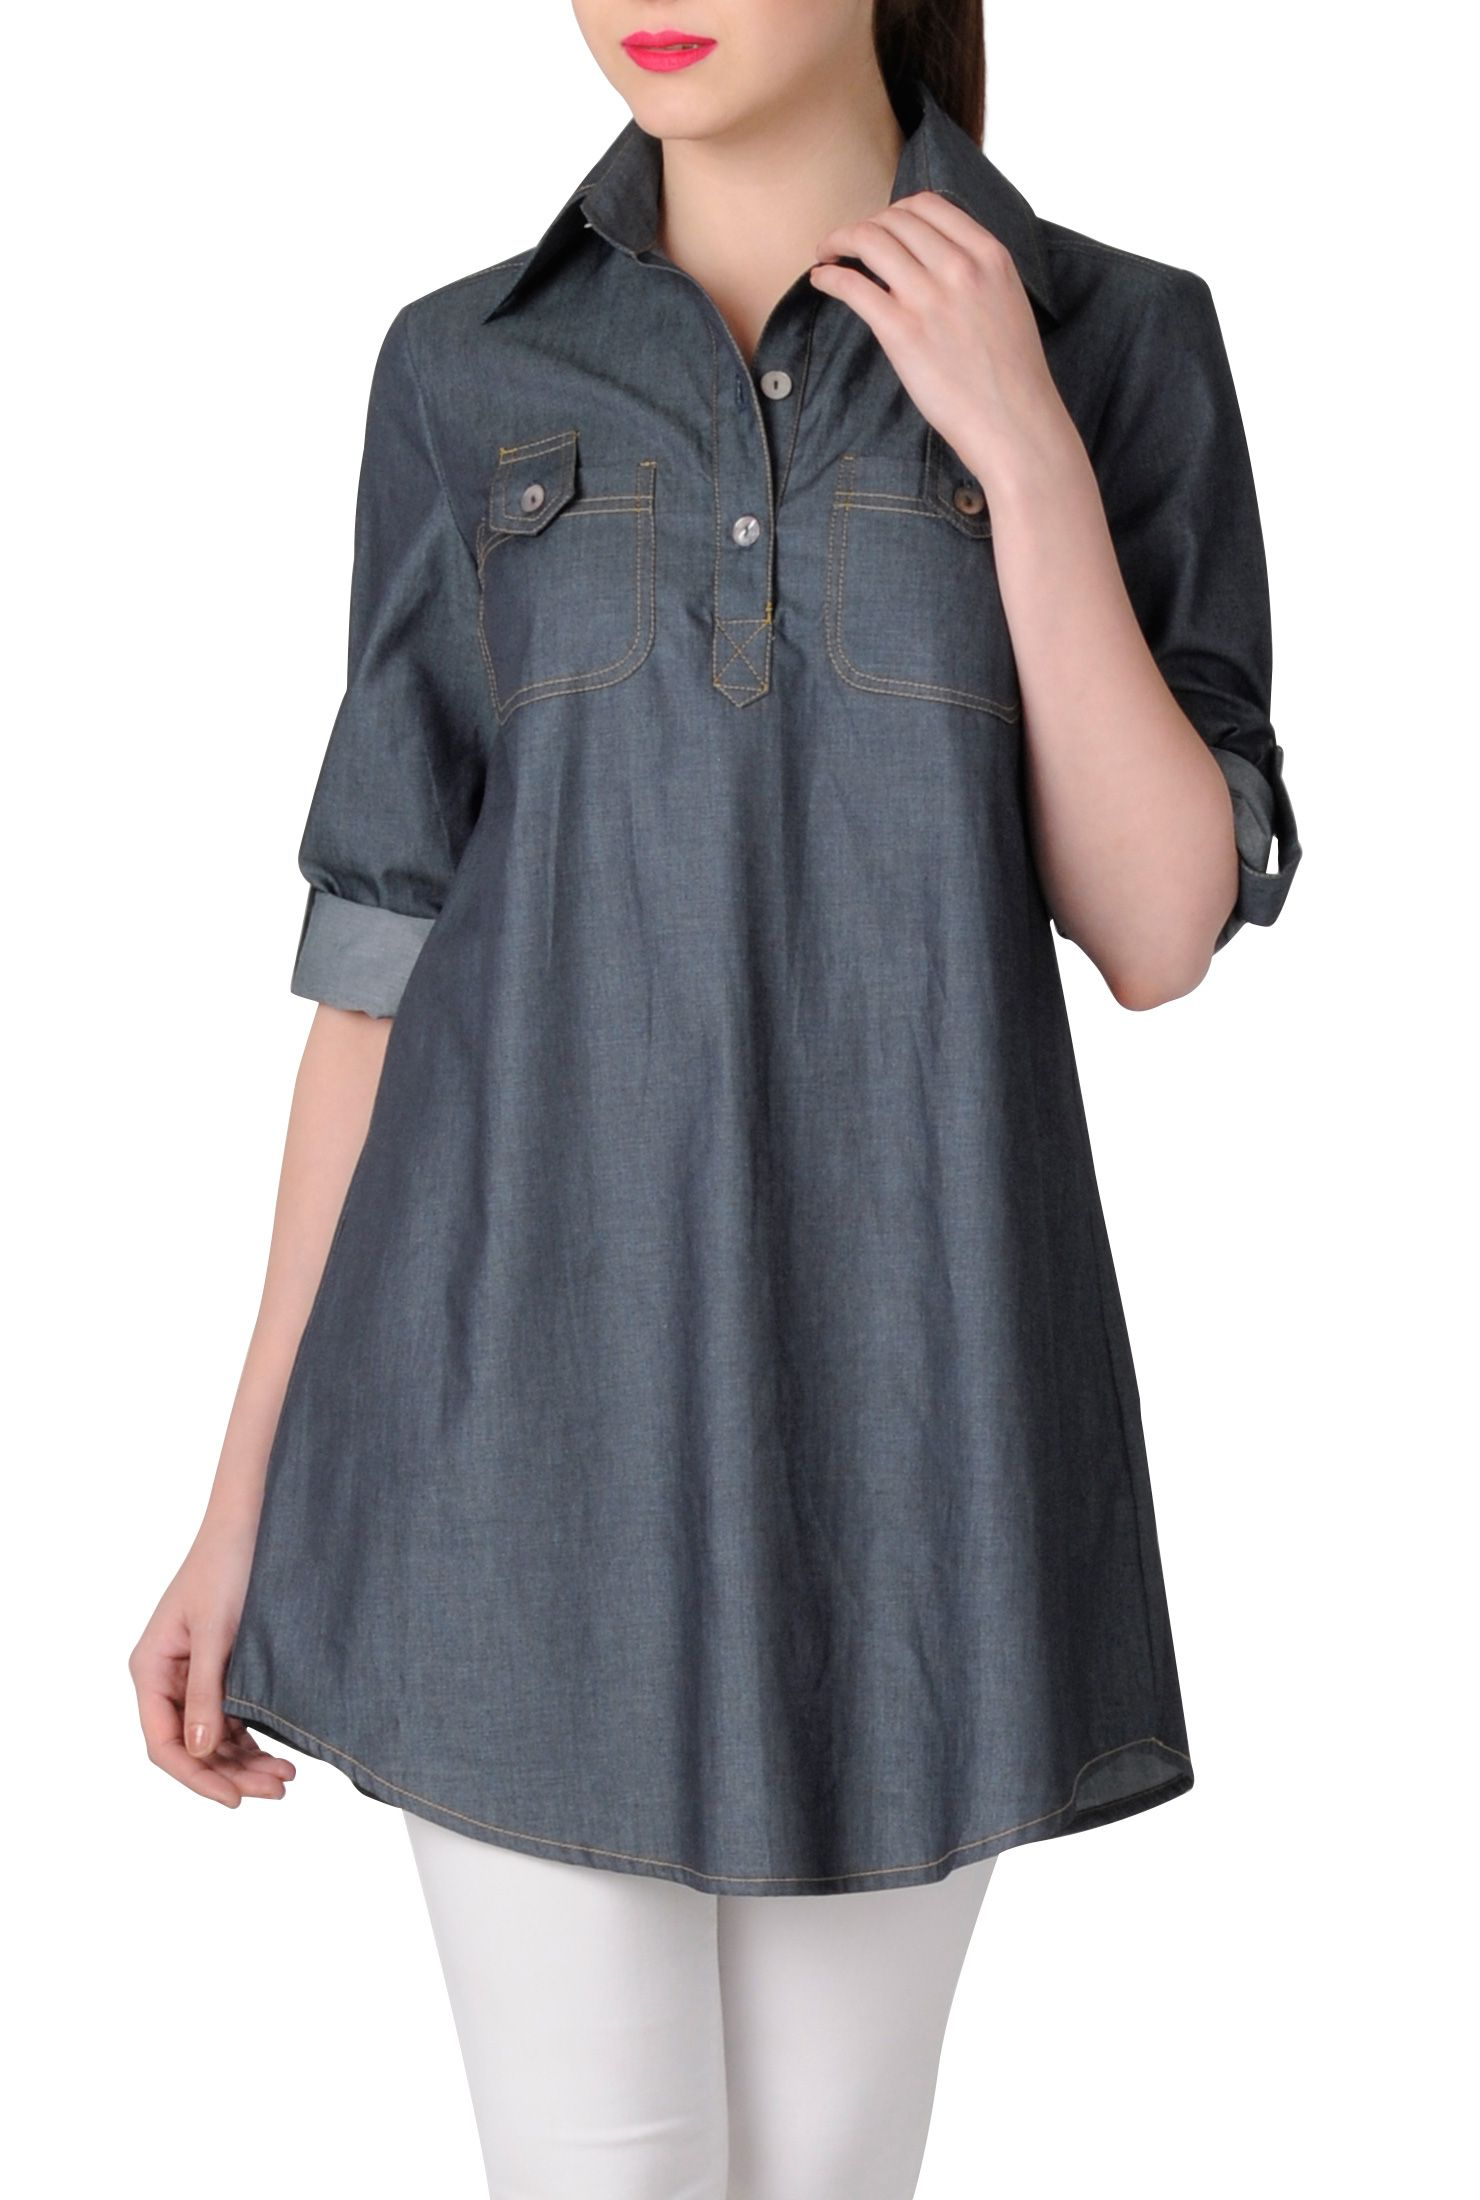 Chambray Denim Tunic Shirt In 2020 Denim Tunic Shirt Fashion Clothes Women Clothes